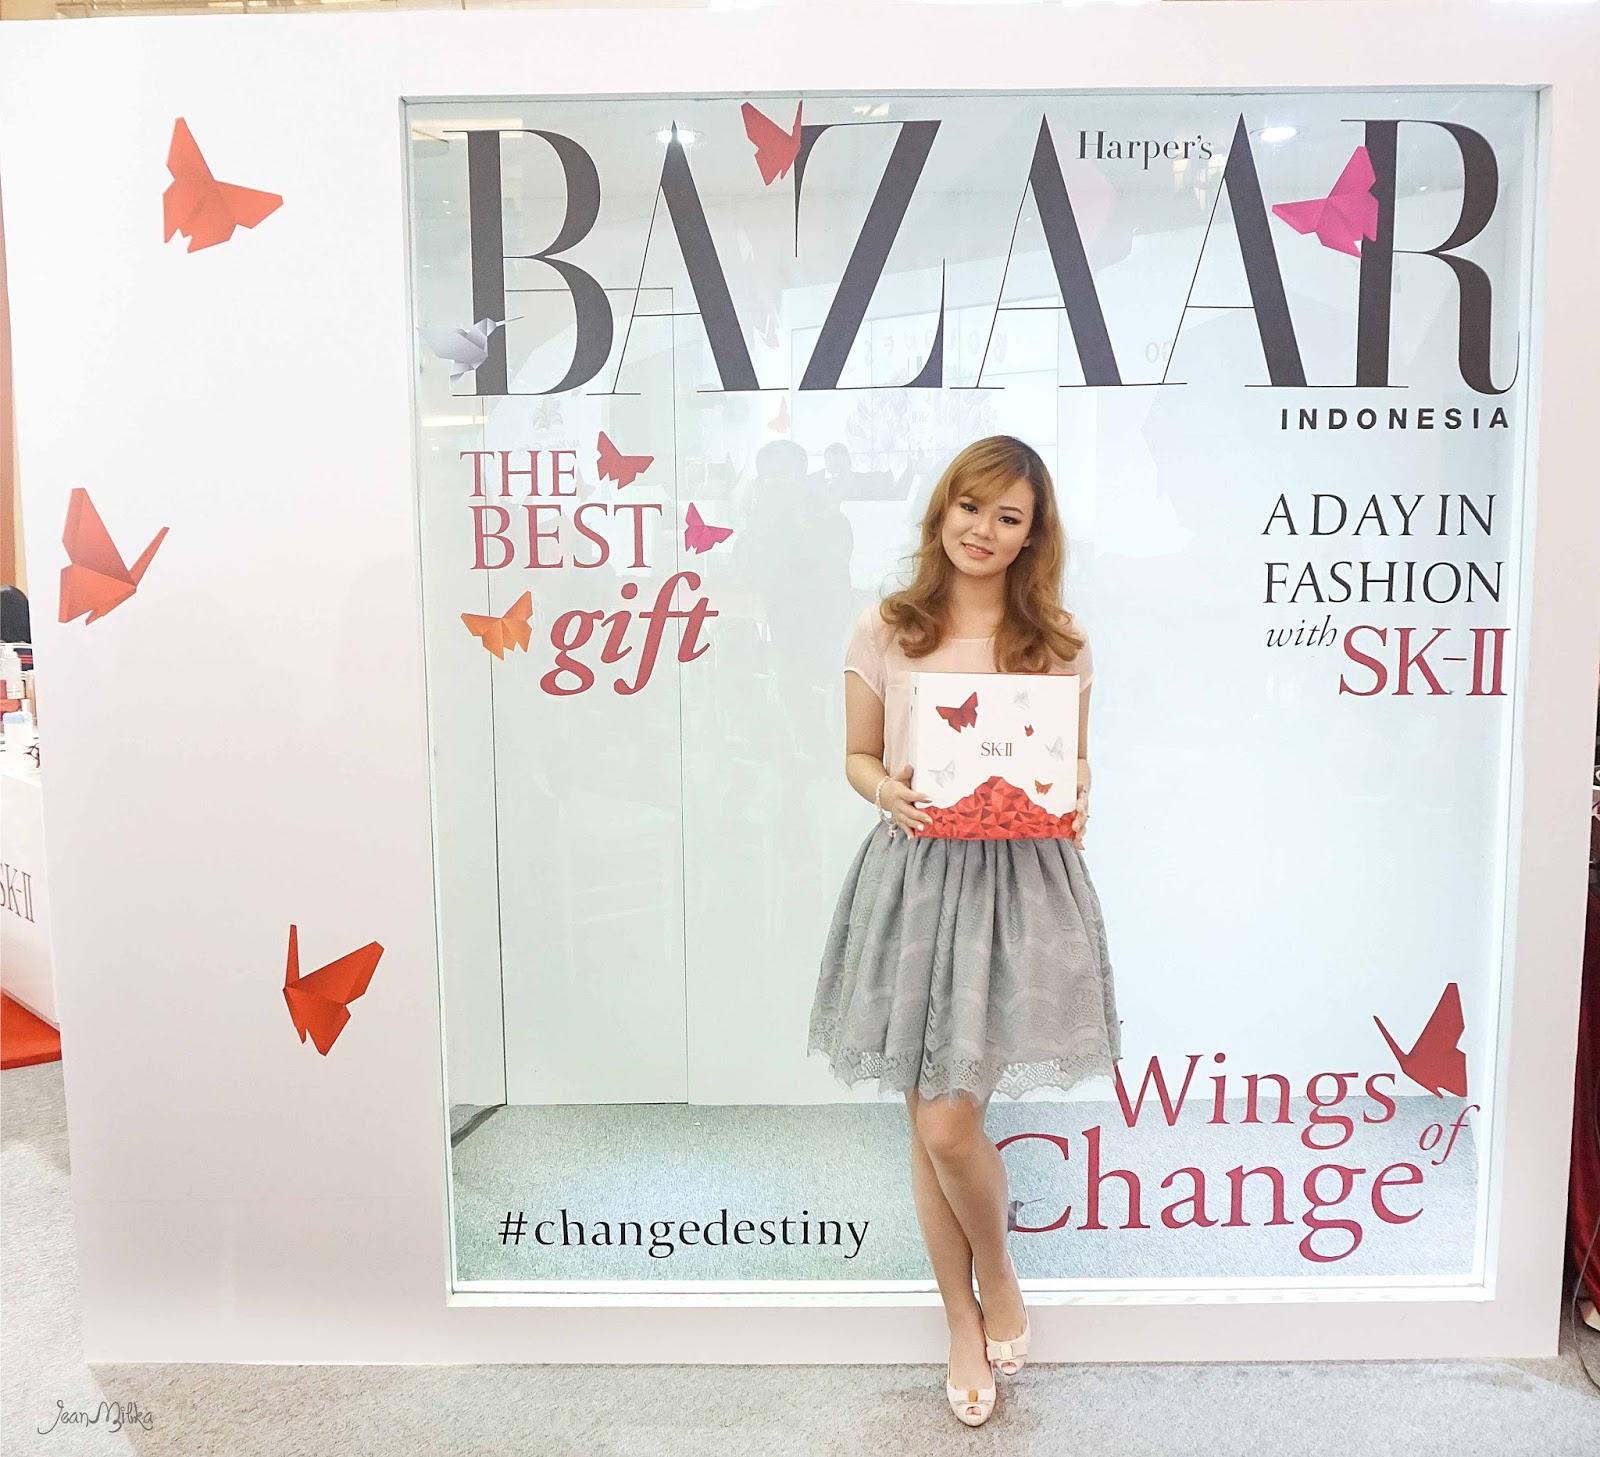 skii, sk ii, best gift, wings of change, limited edition, skin care, skii limited edition, skii gift, jeanmilka, jean milka